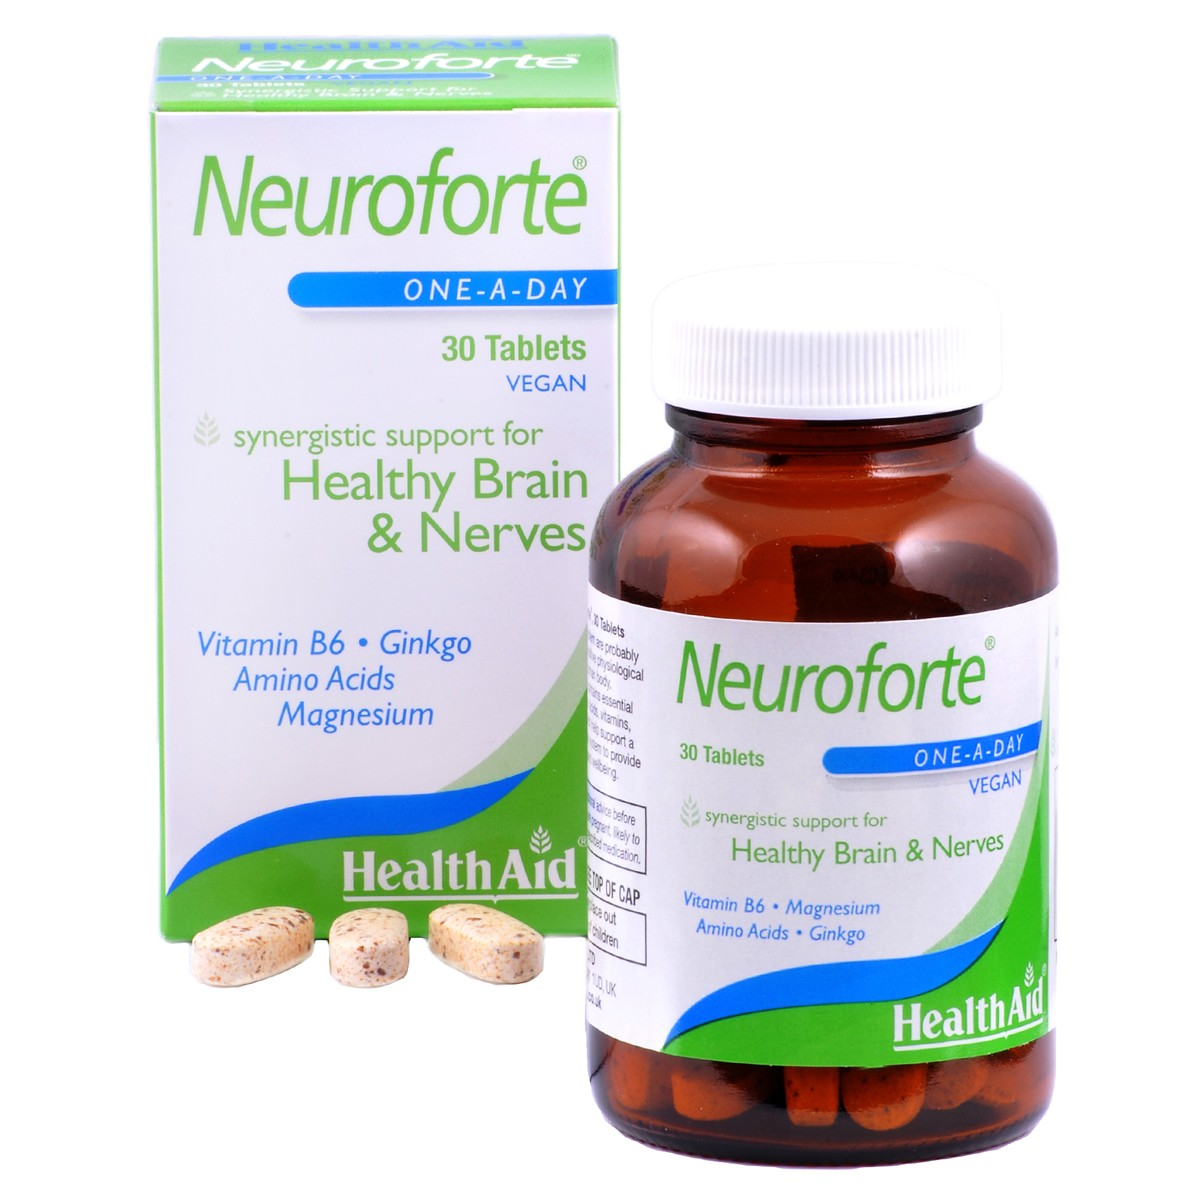 HealthAid NeuroForte